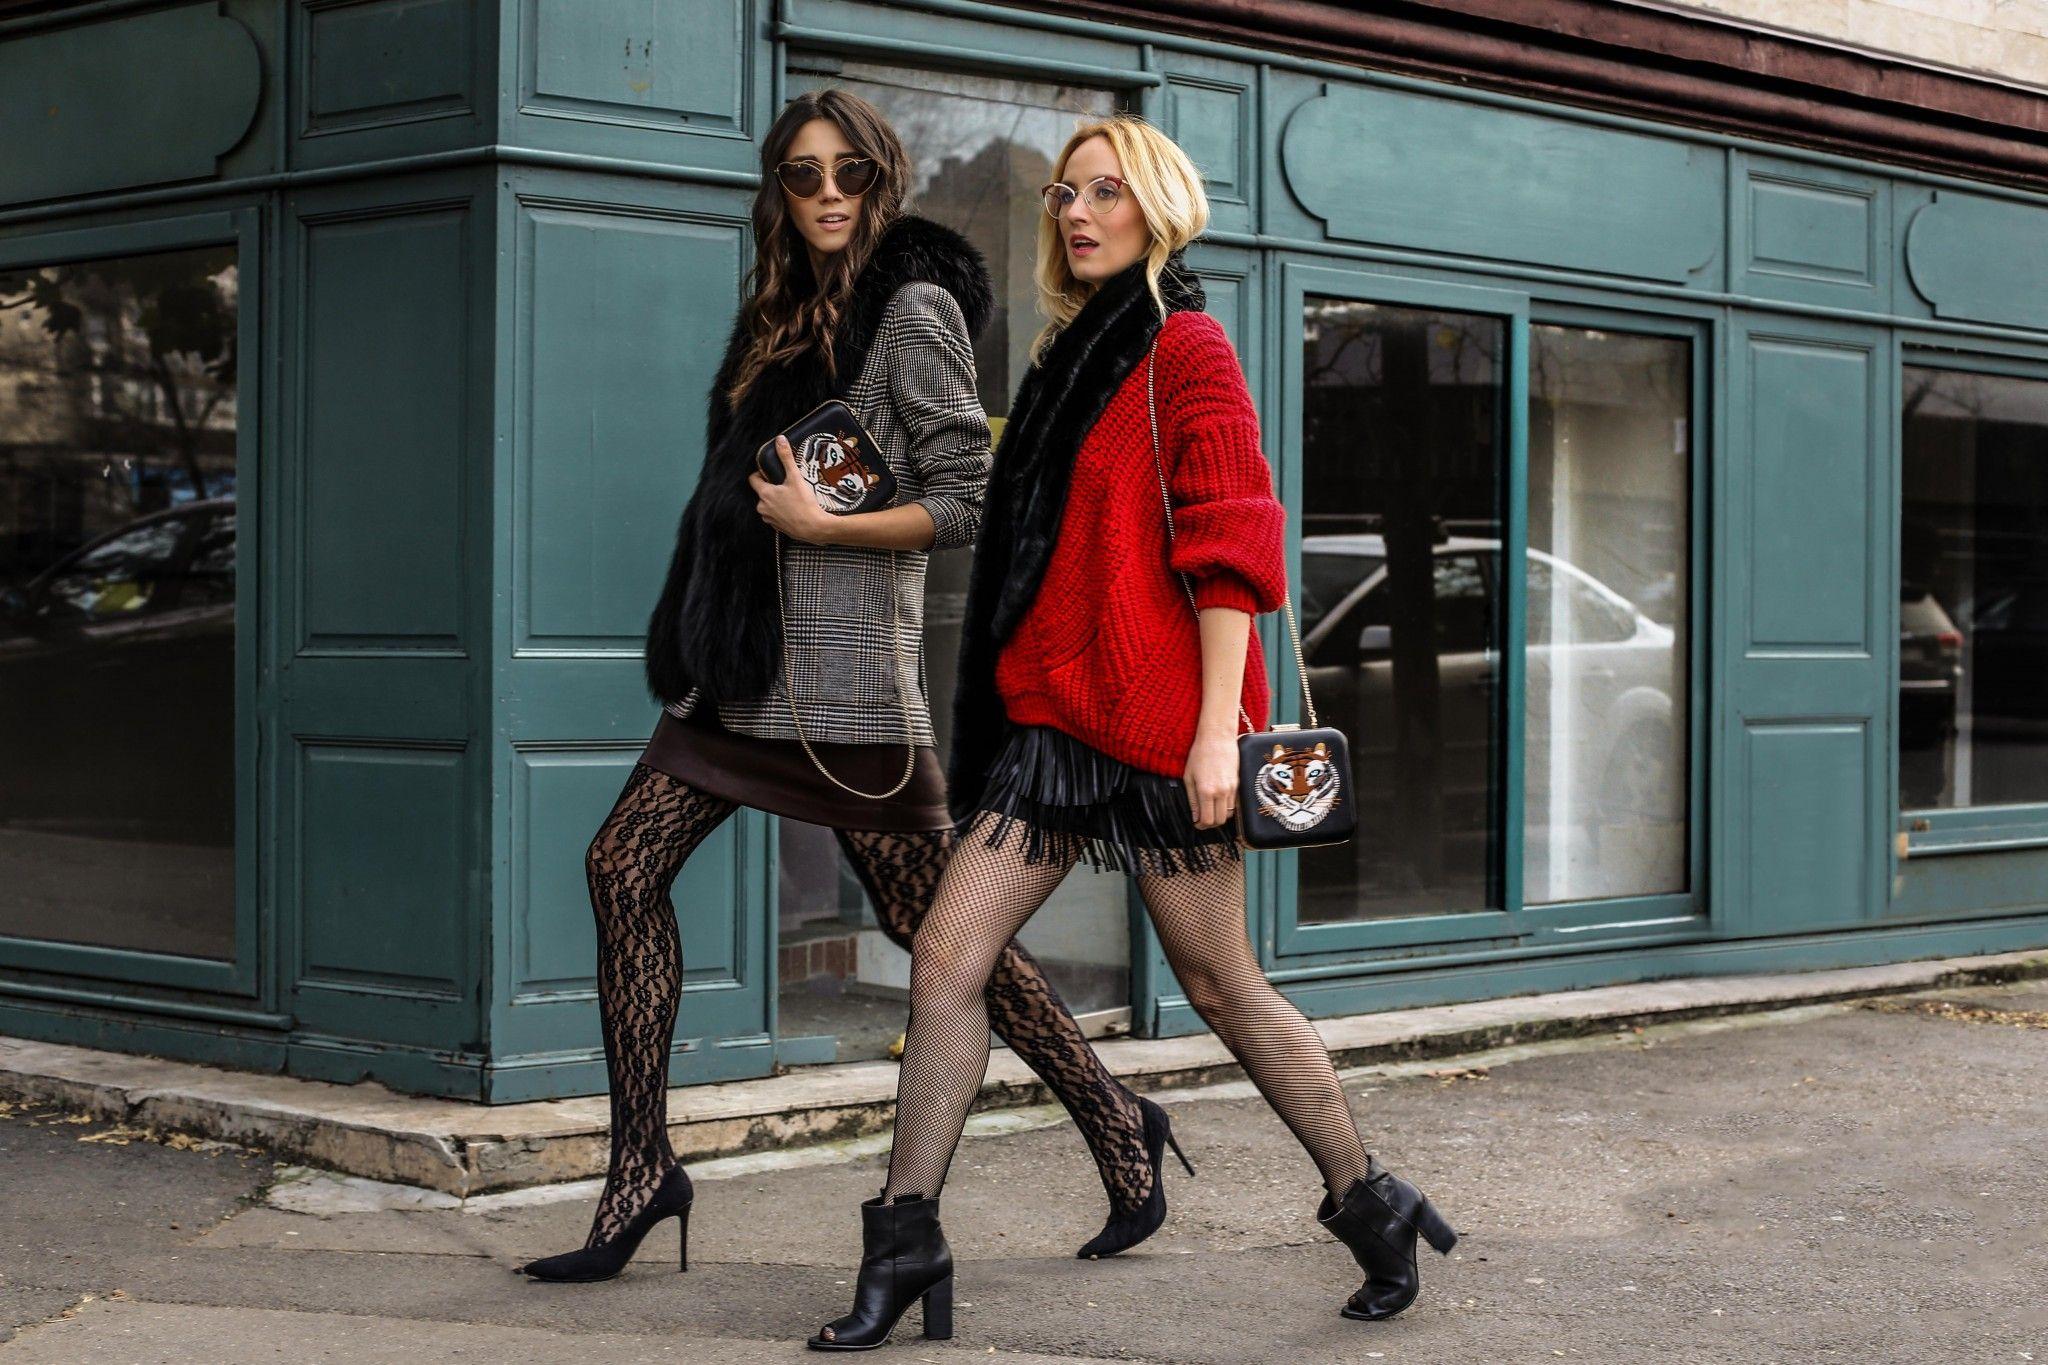 3black_friday_fabulous-muses_bibloo_winter_shopping